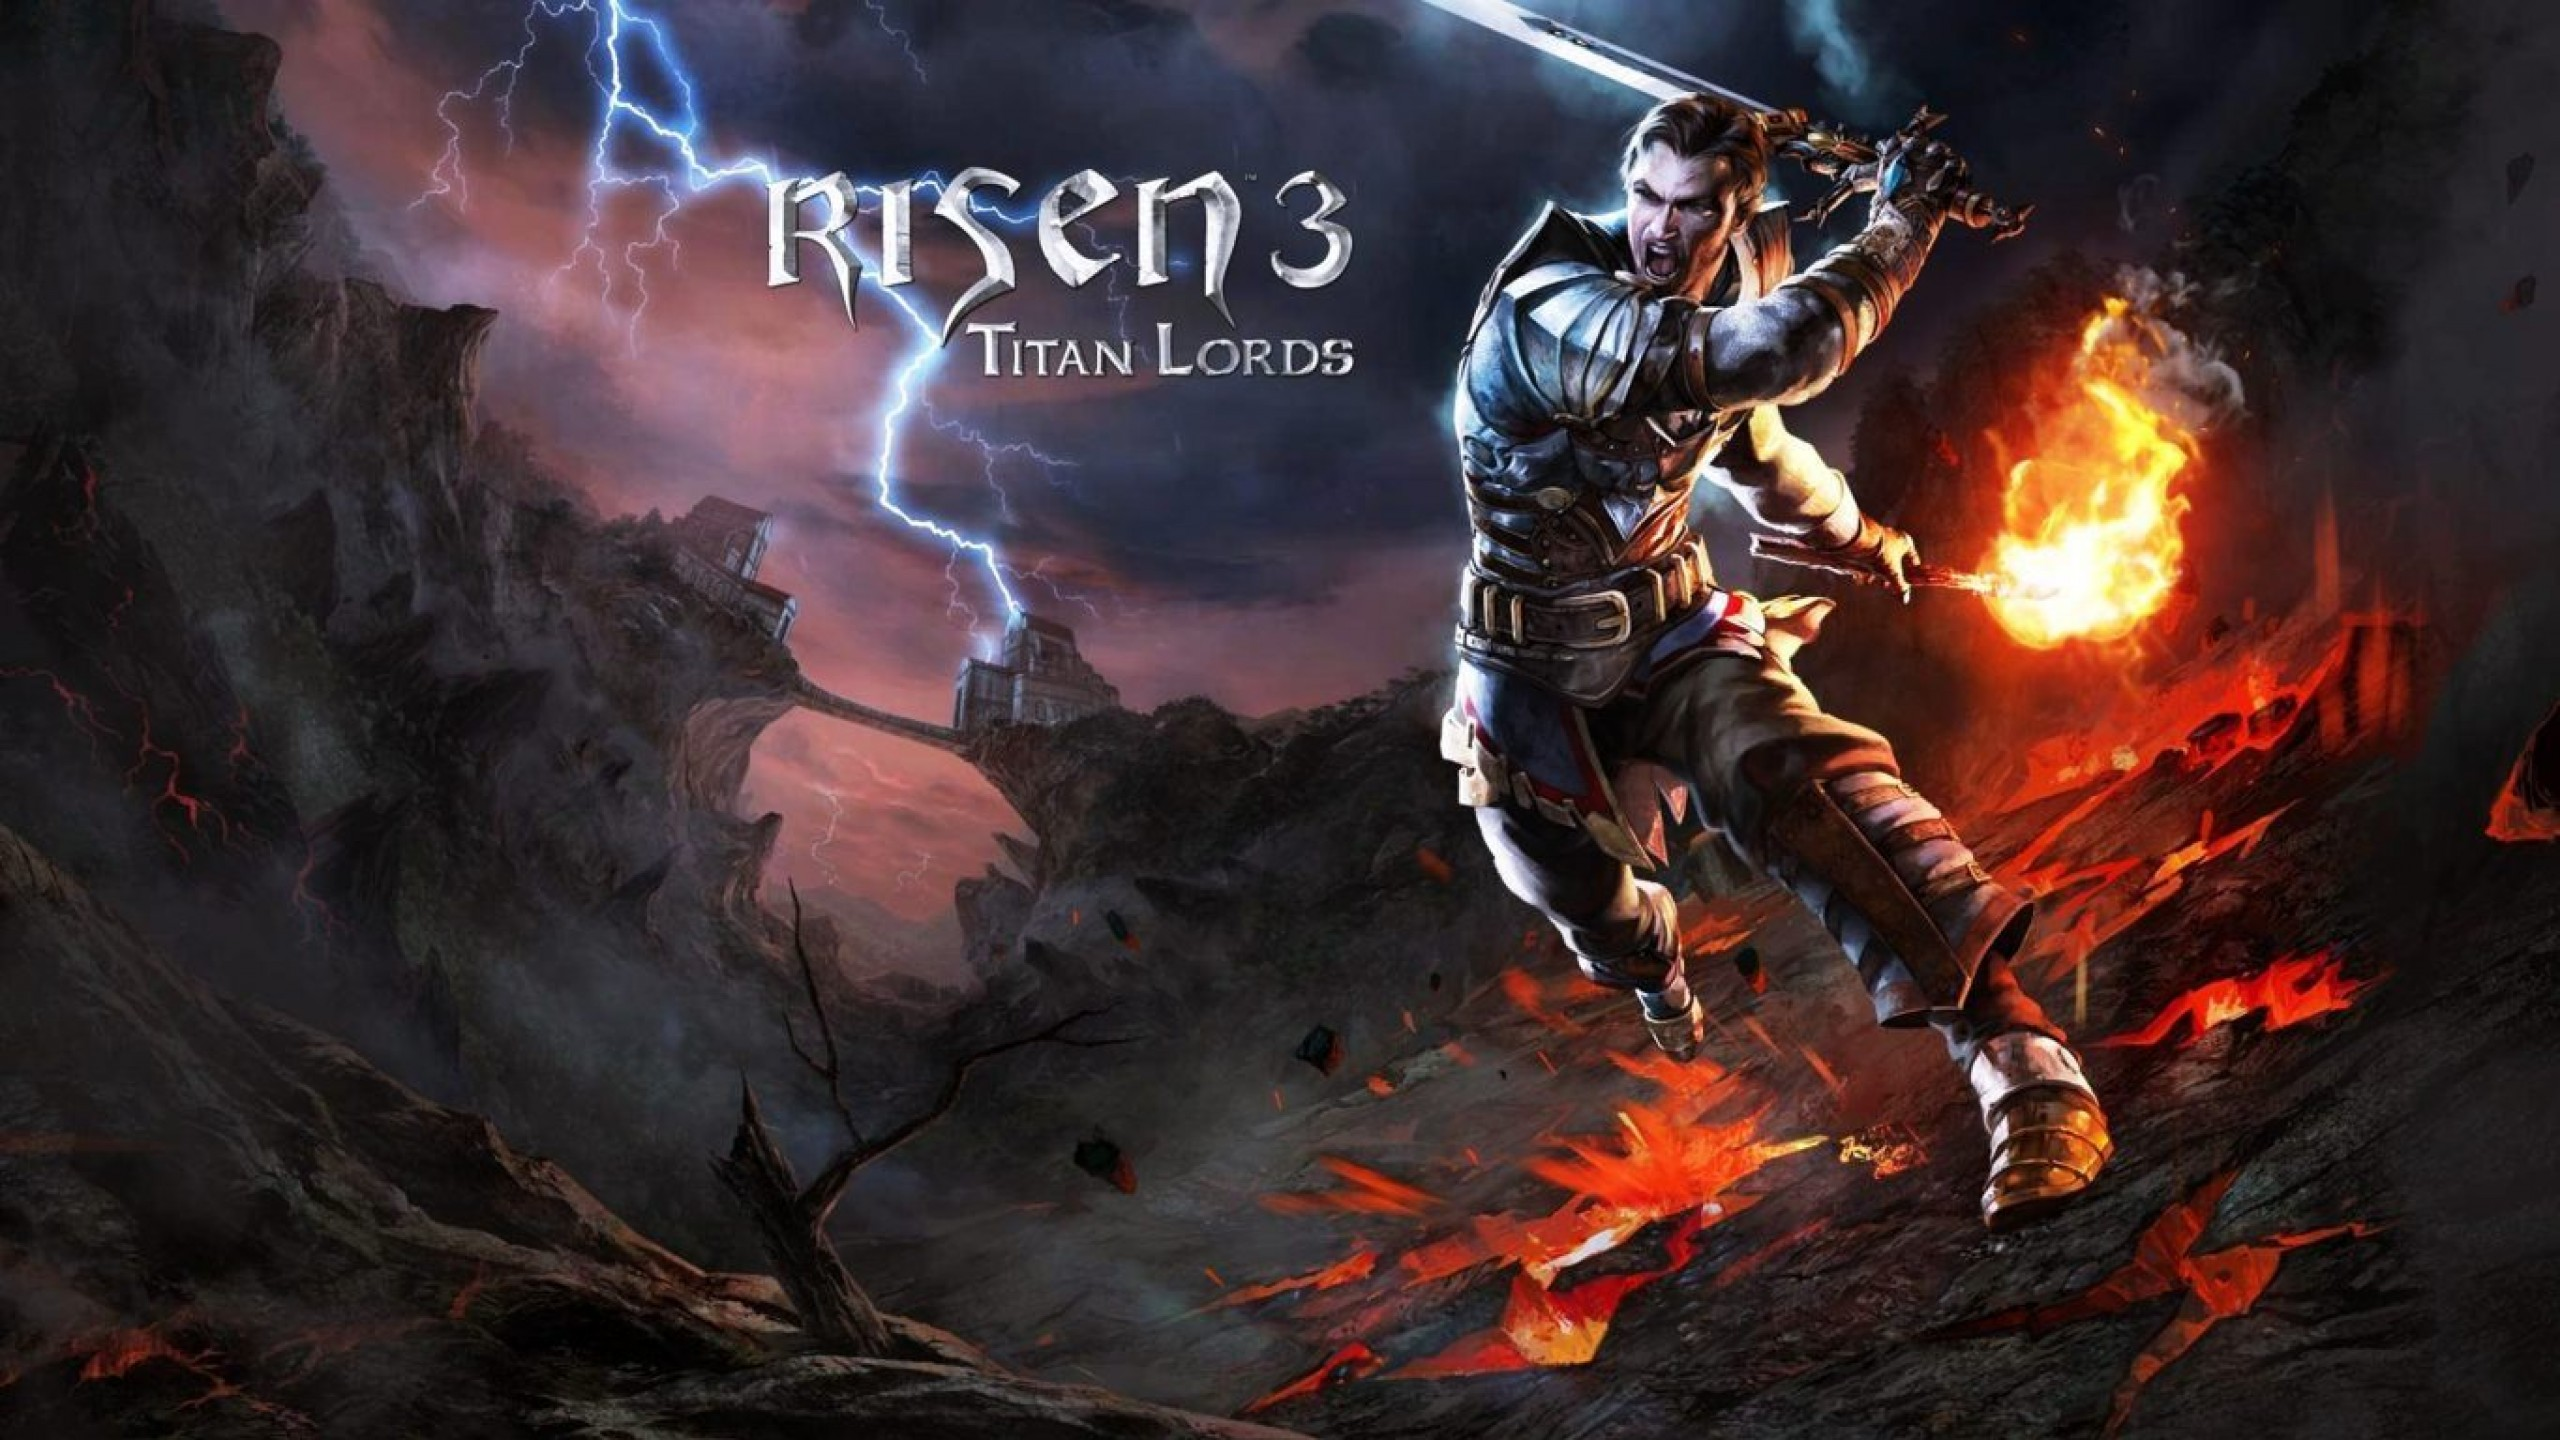 risen-3-titan-lords-hd-wallpaper-2.jpg